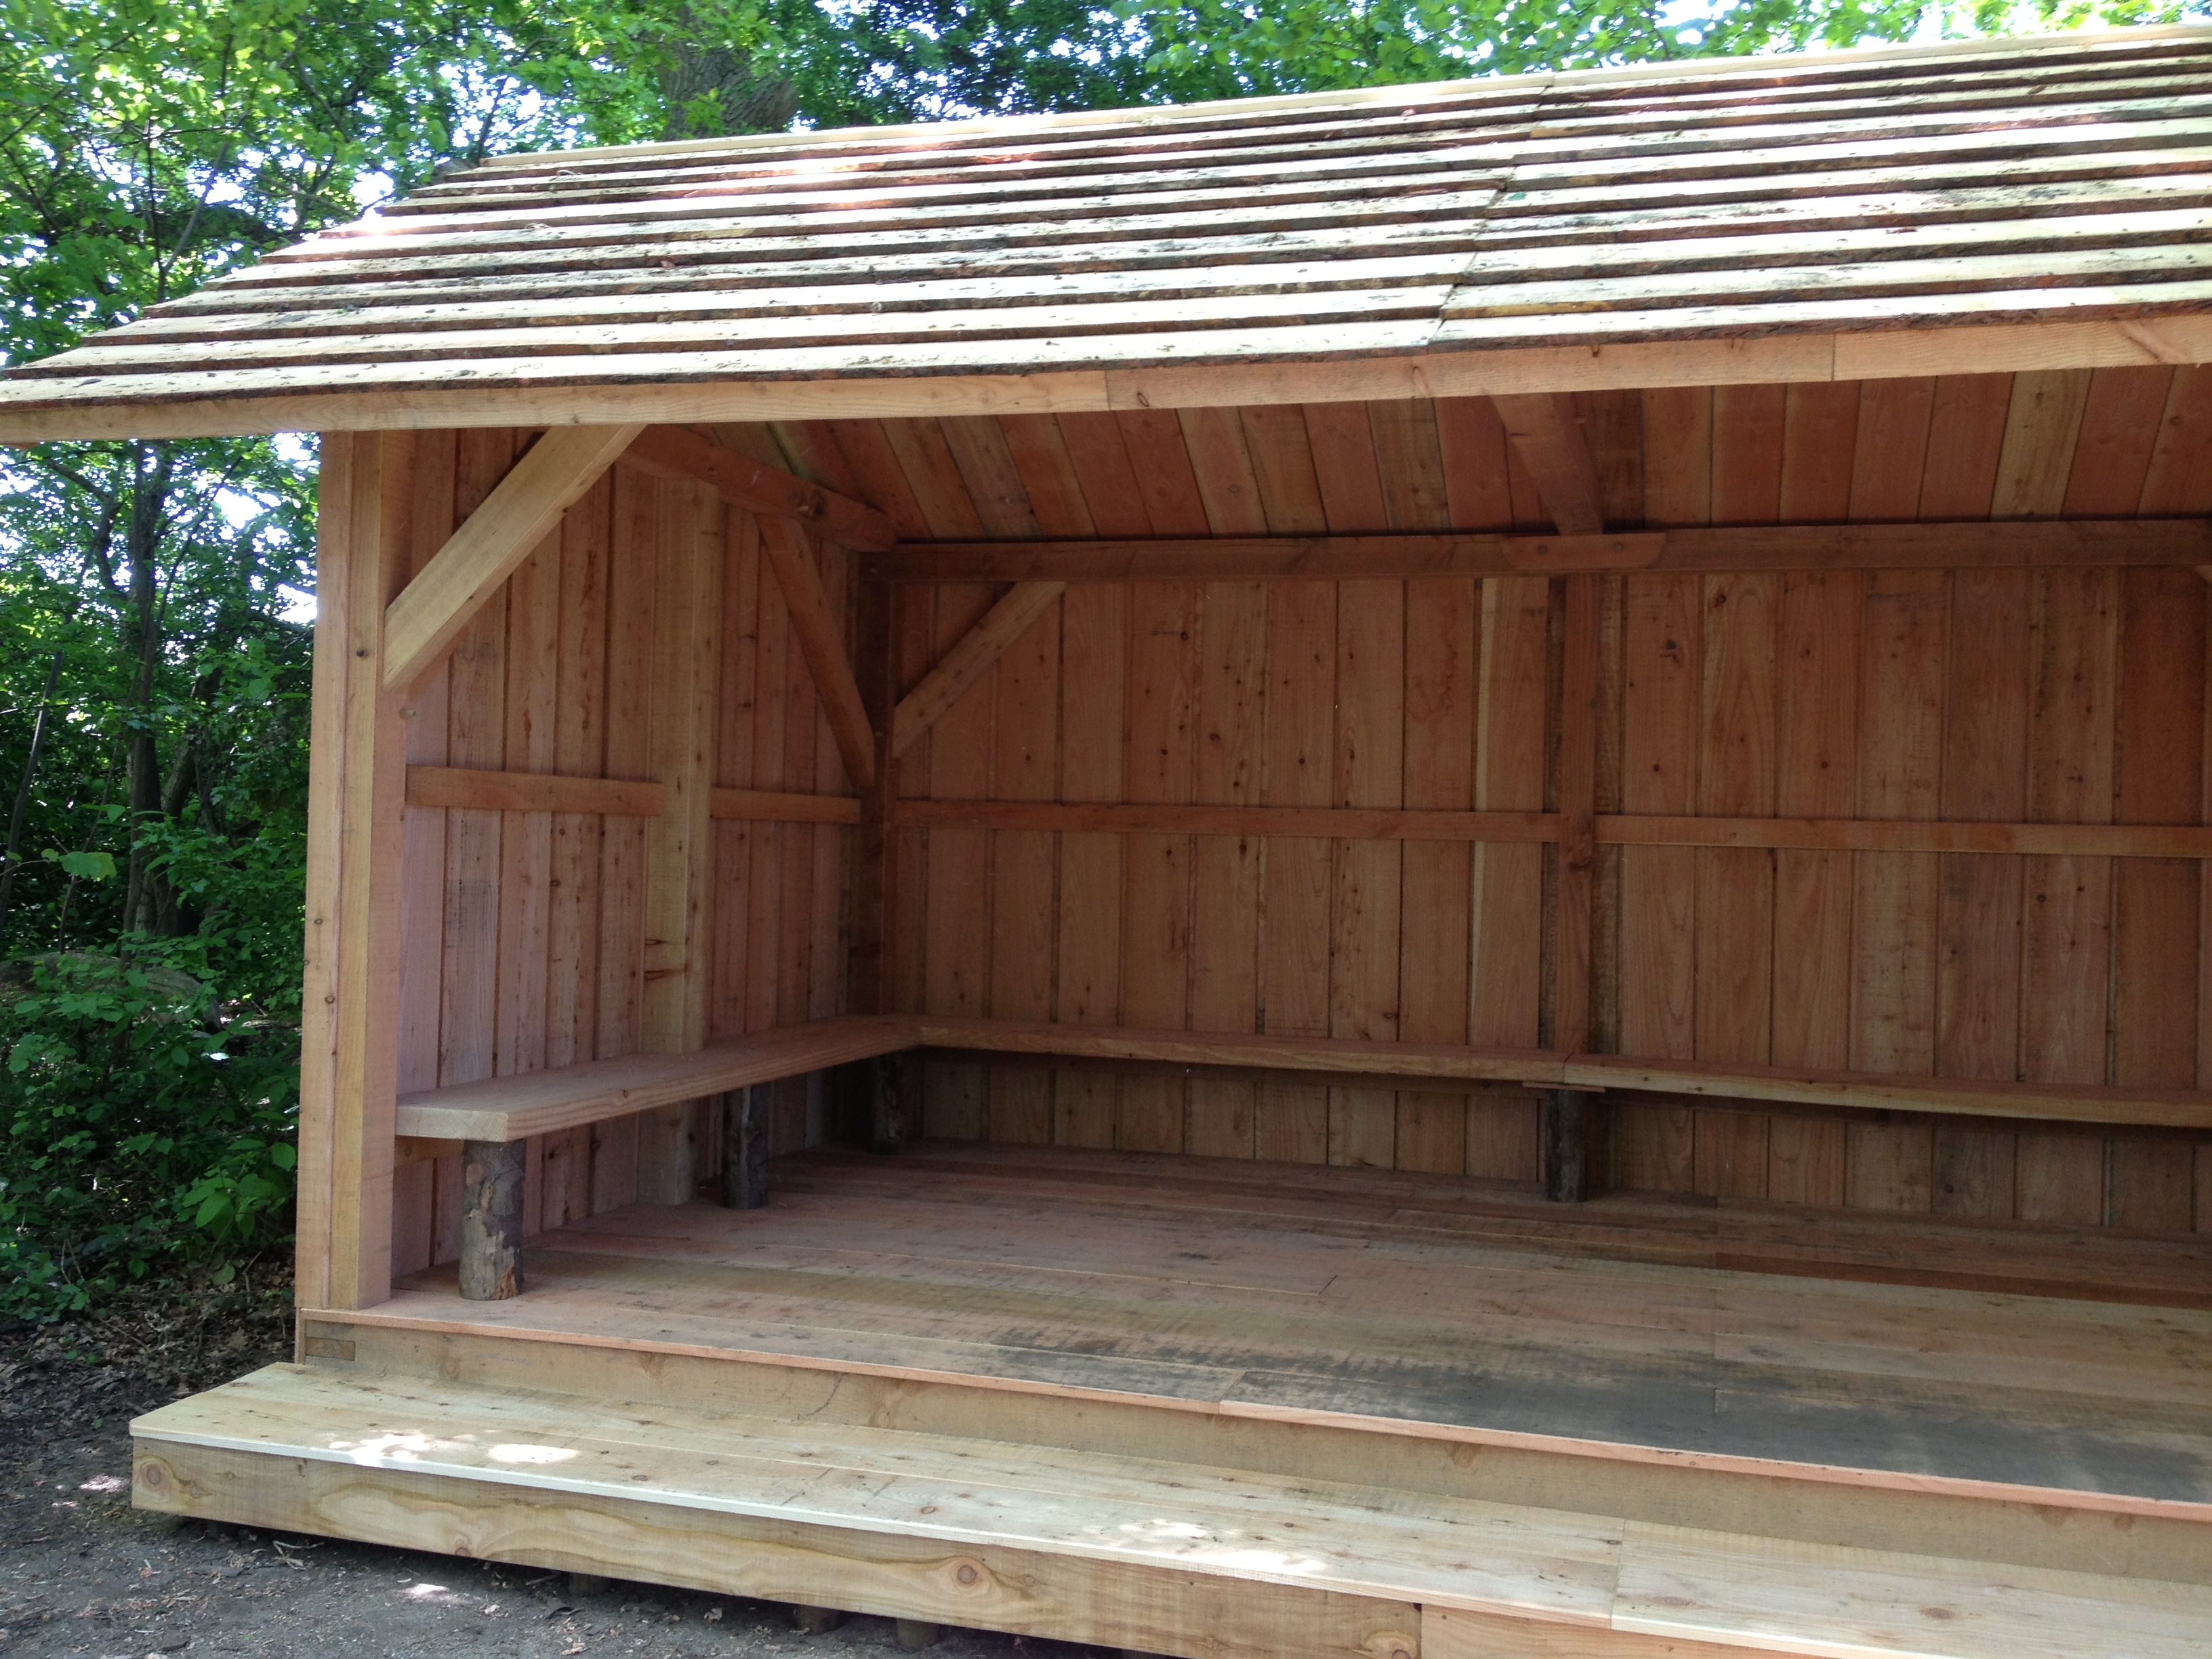 School Classroom Shelter